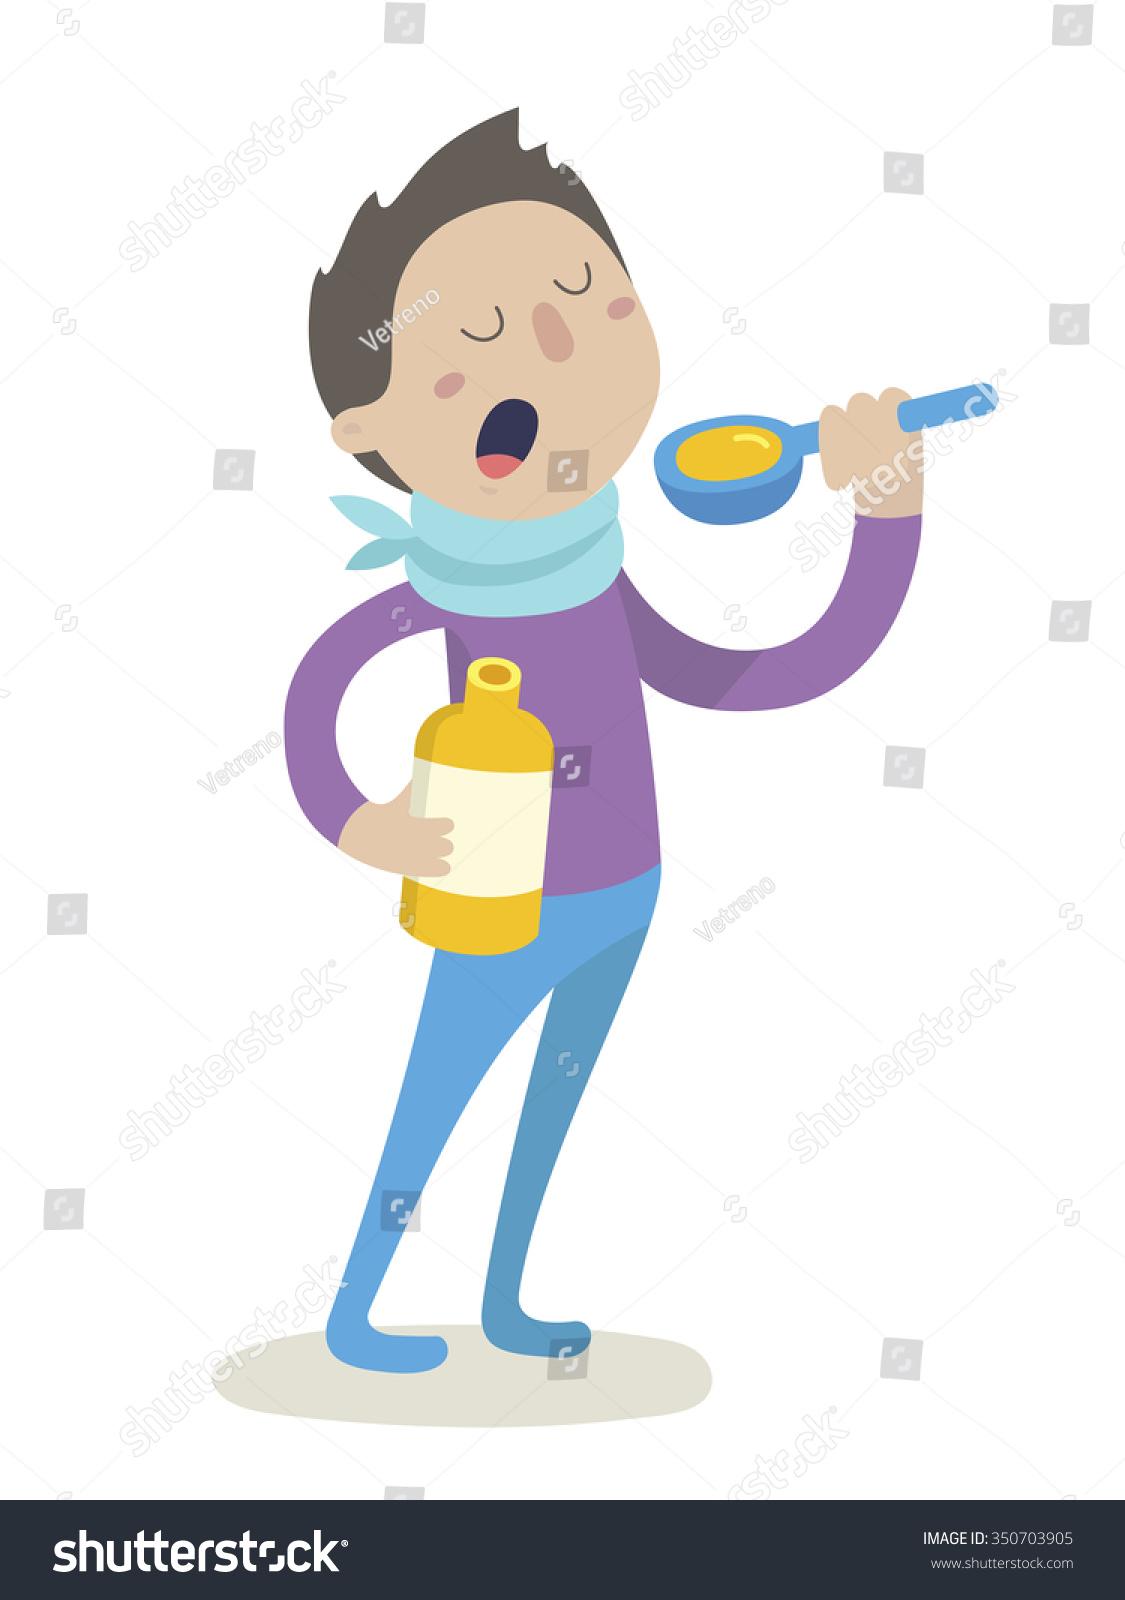 sick boy flu virus takes cough stock vector royalty free 350703905 https www shutterstock com image vector sick boy flu virus takes cough 350703905